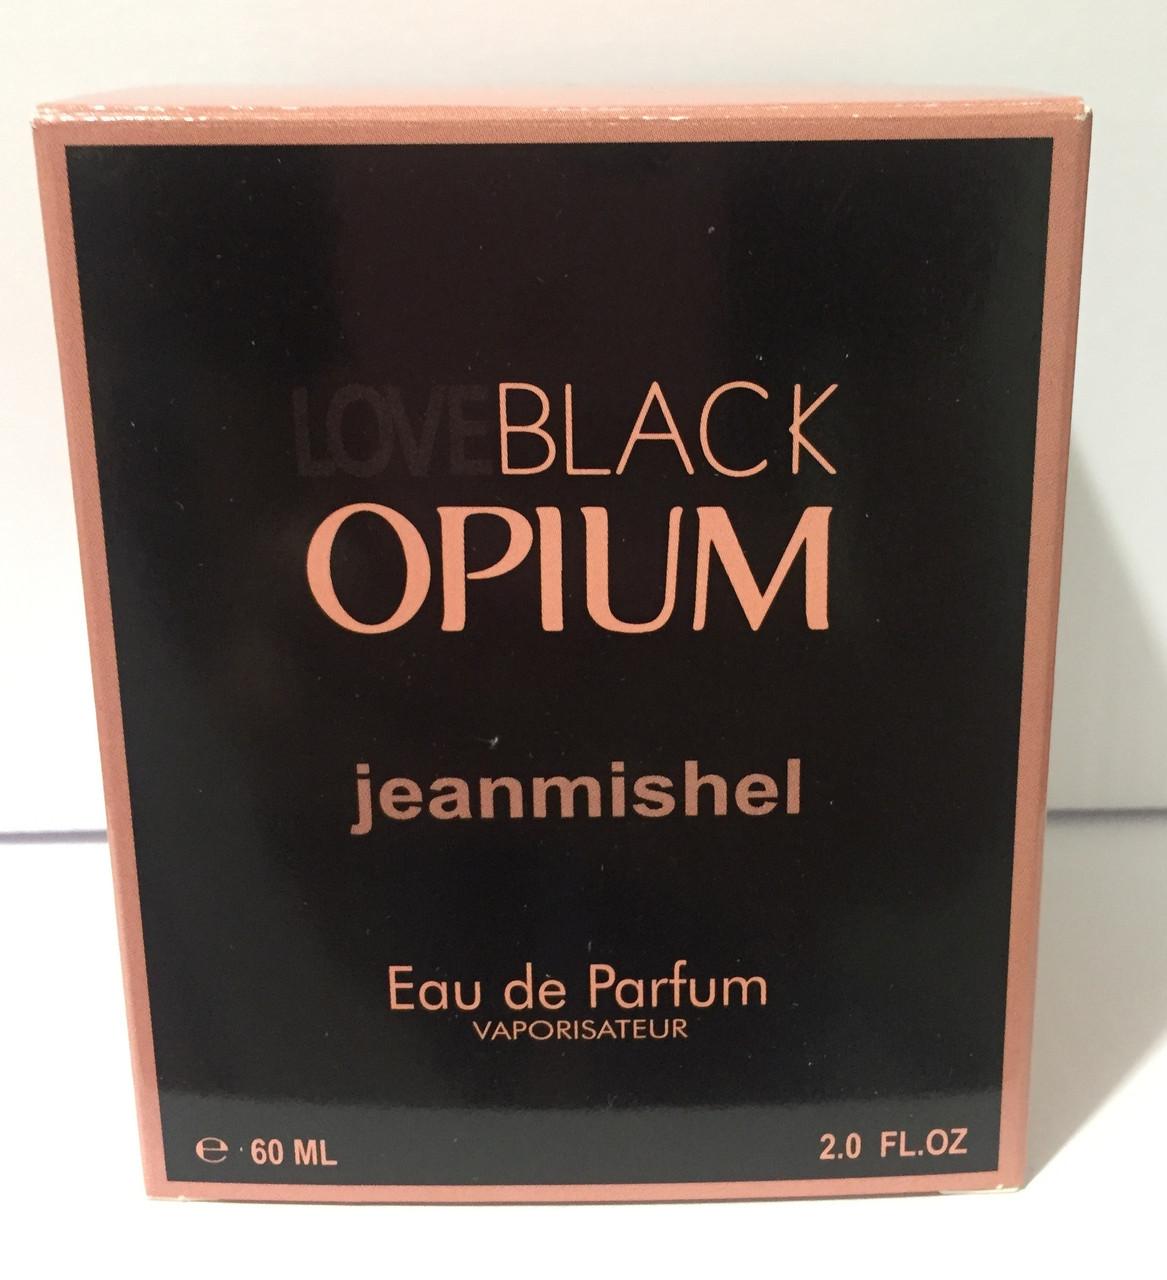 Тестер в подарочной упаковке jeanmishel loveBlack Opium 60 мл